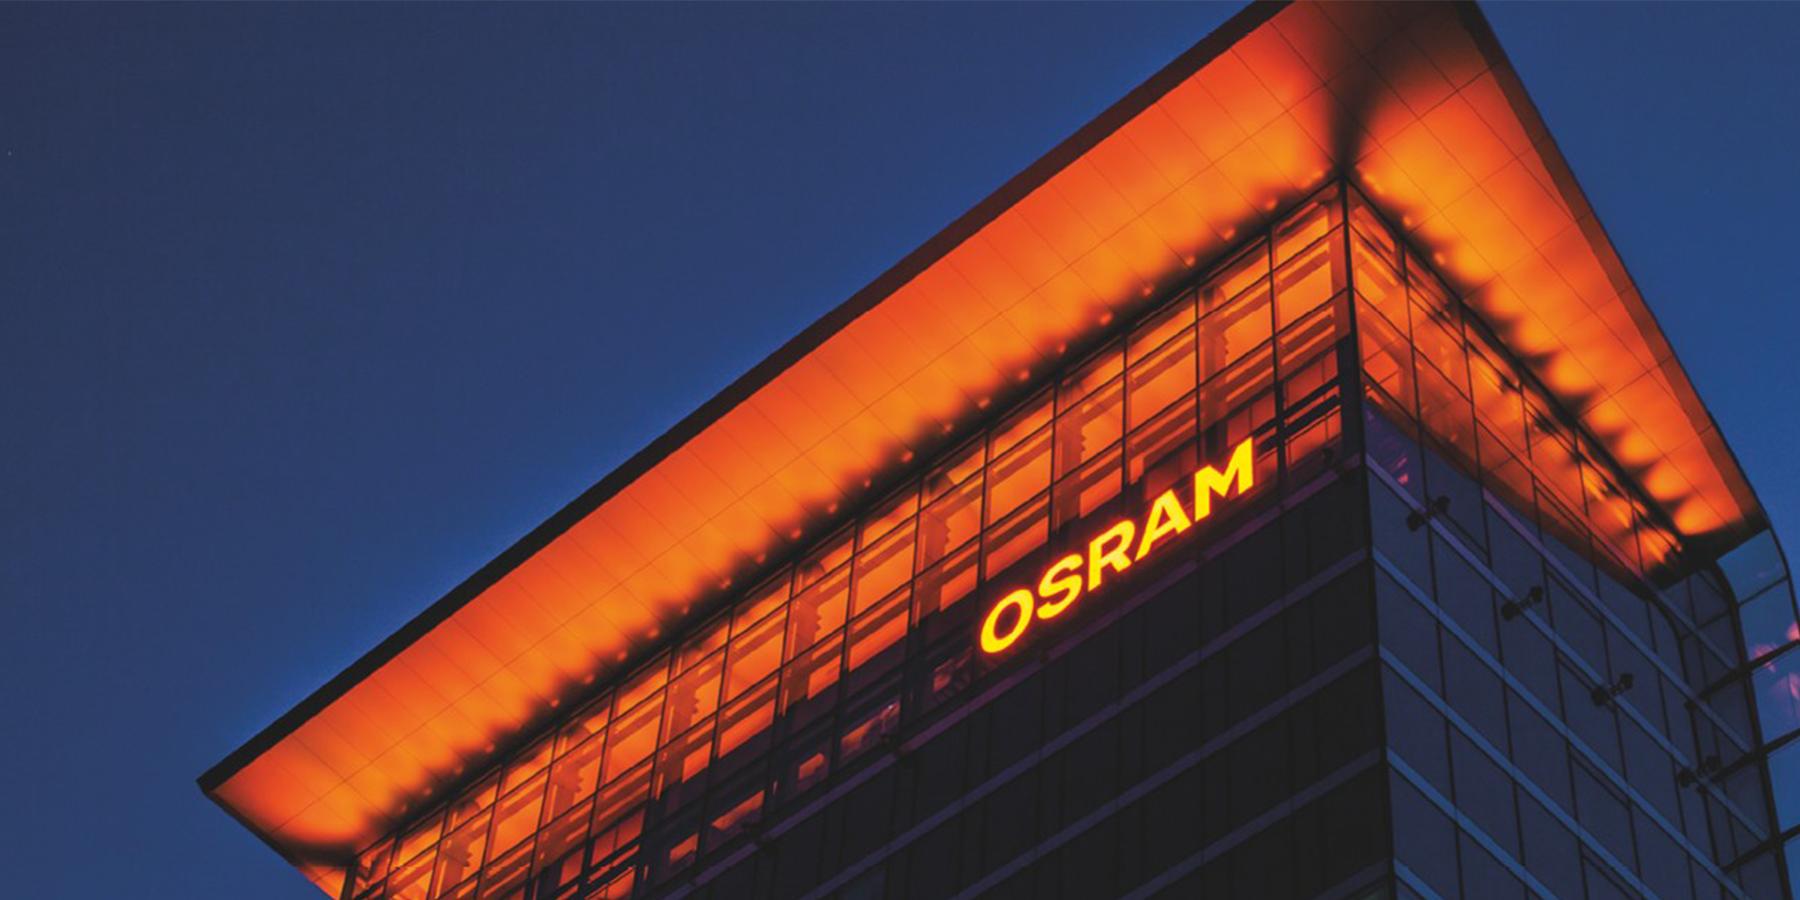 OSRAM – LEDVANCE